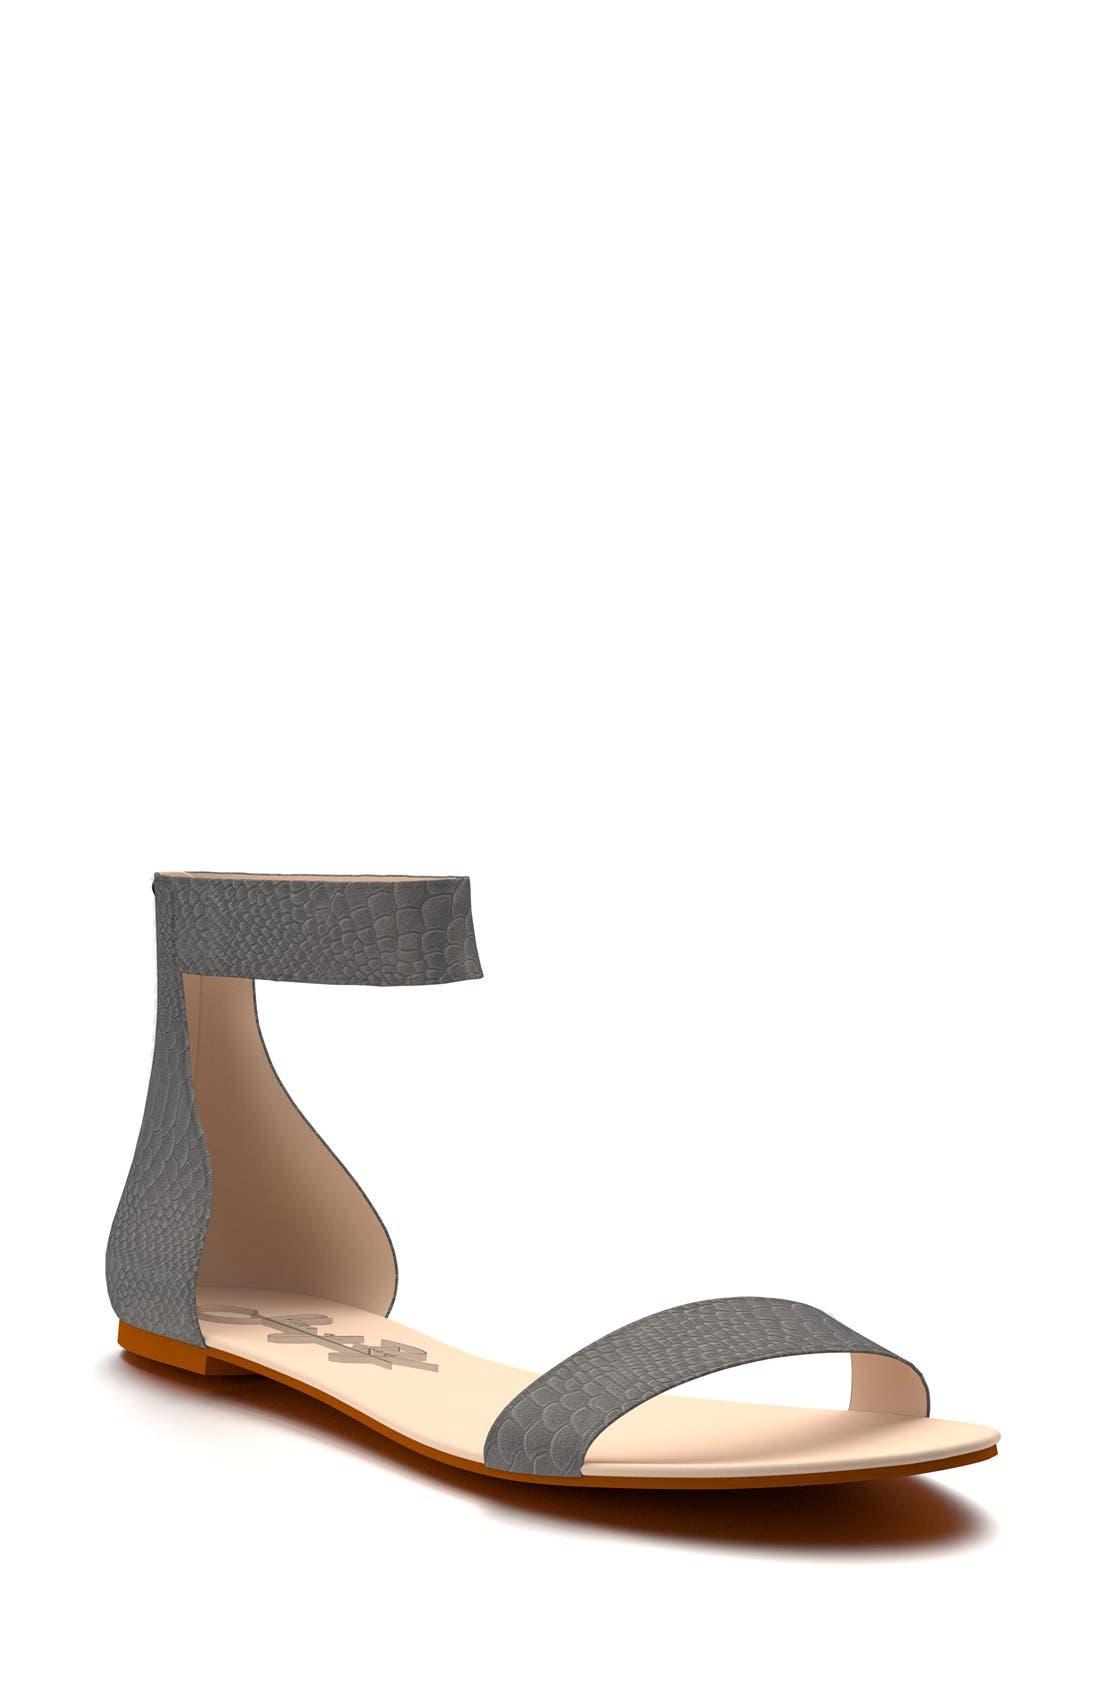 SHOES OF PREY Ankle Strap Sandal